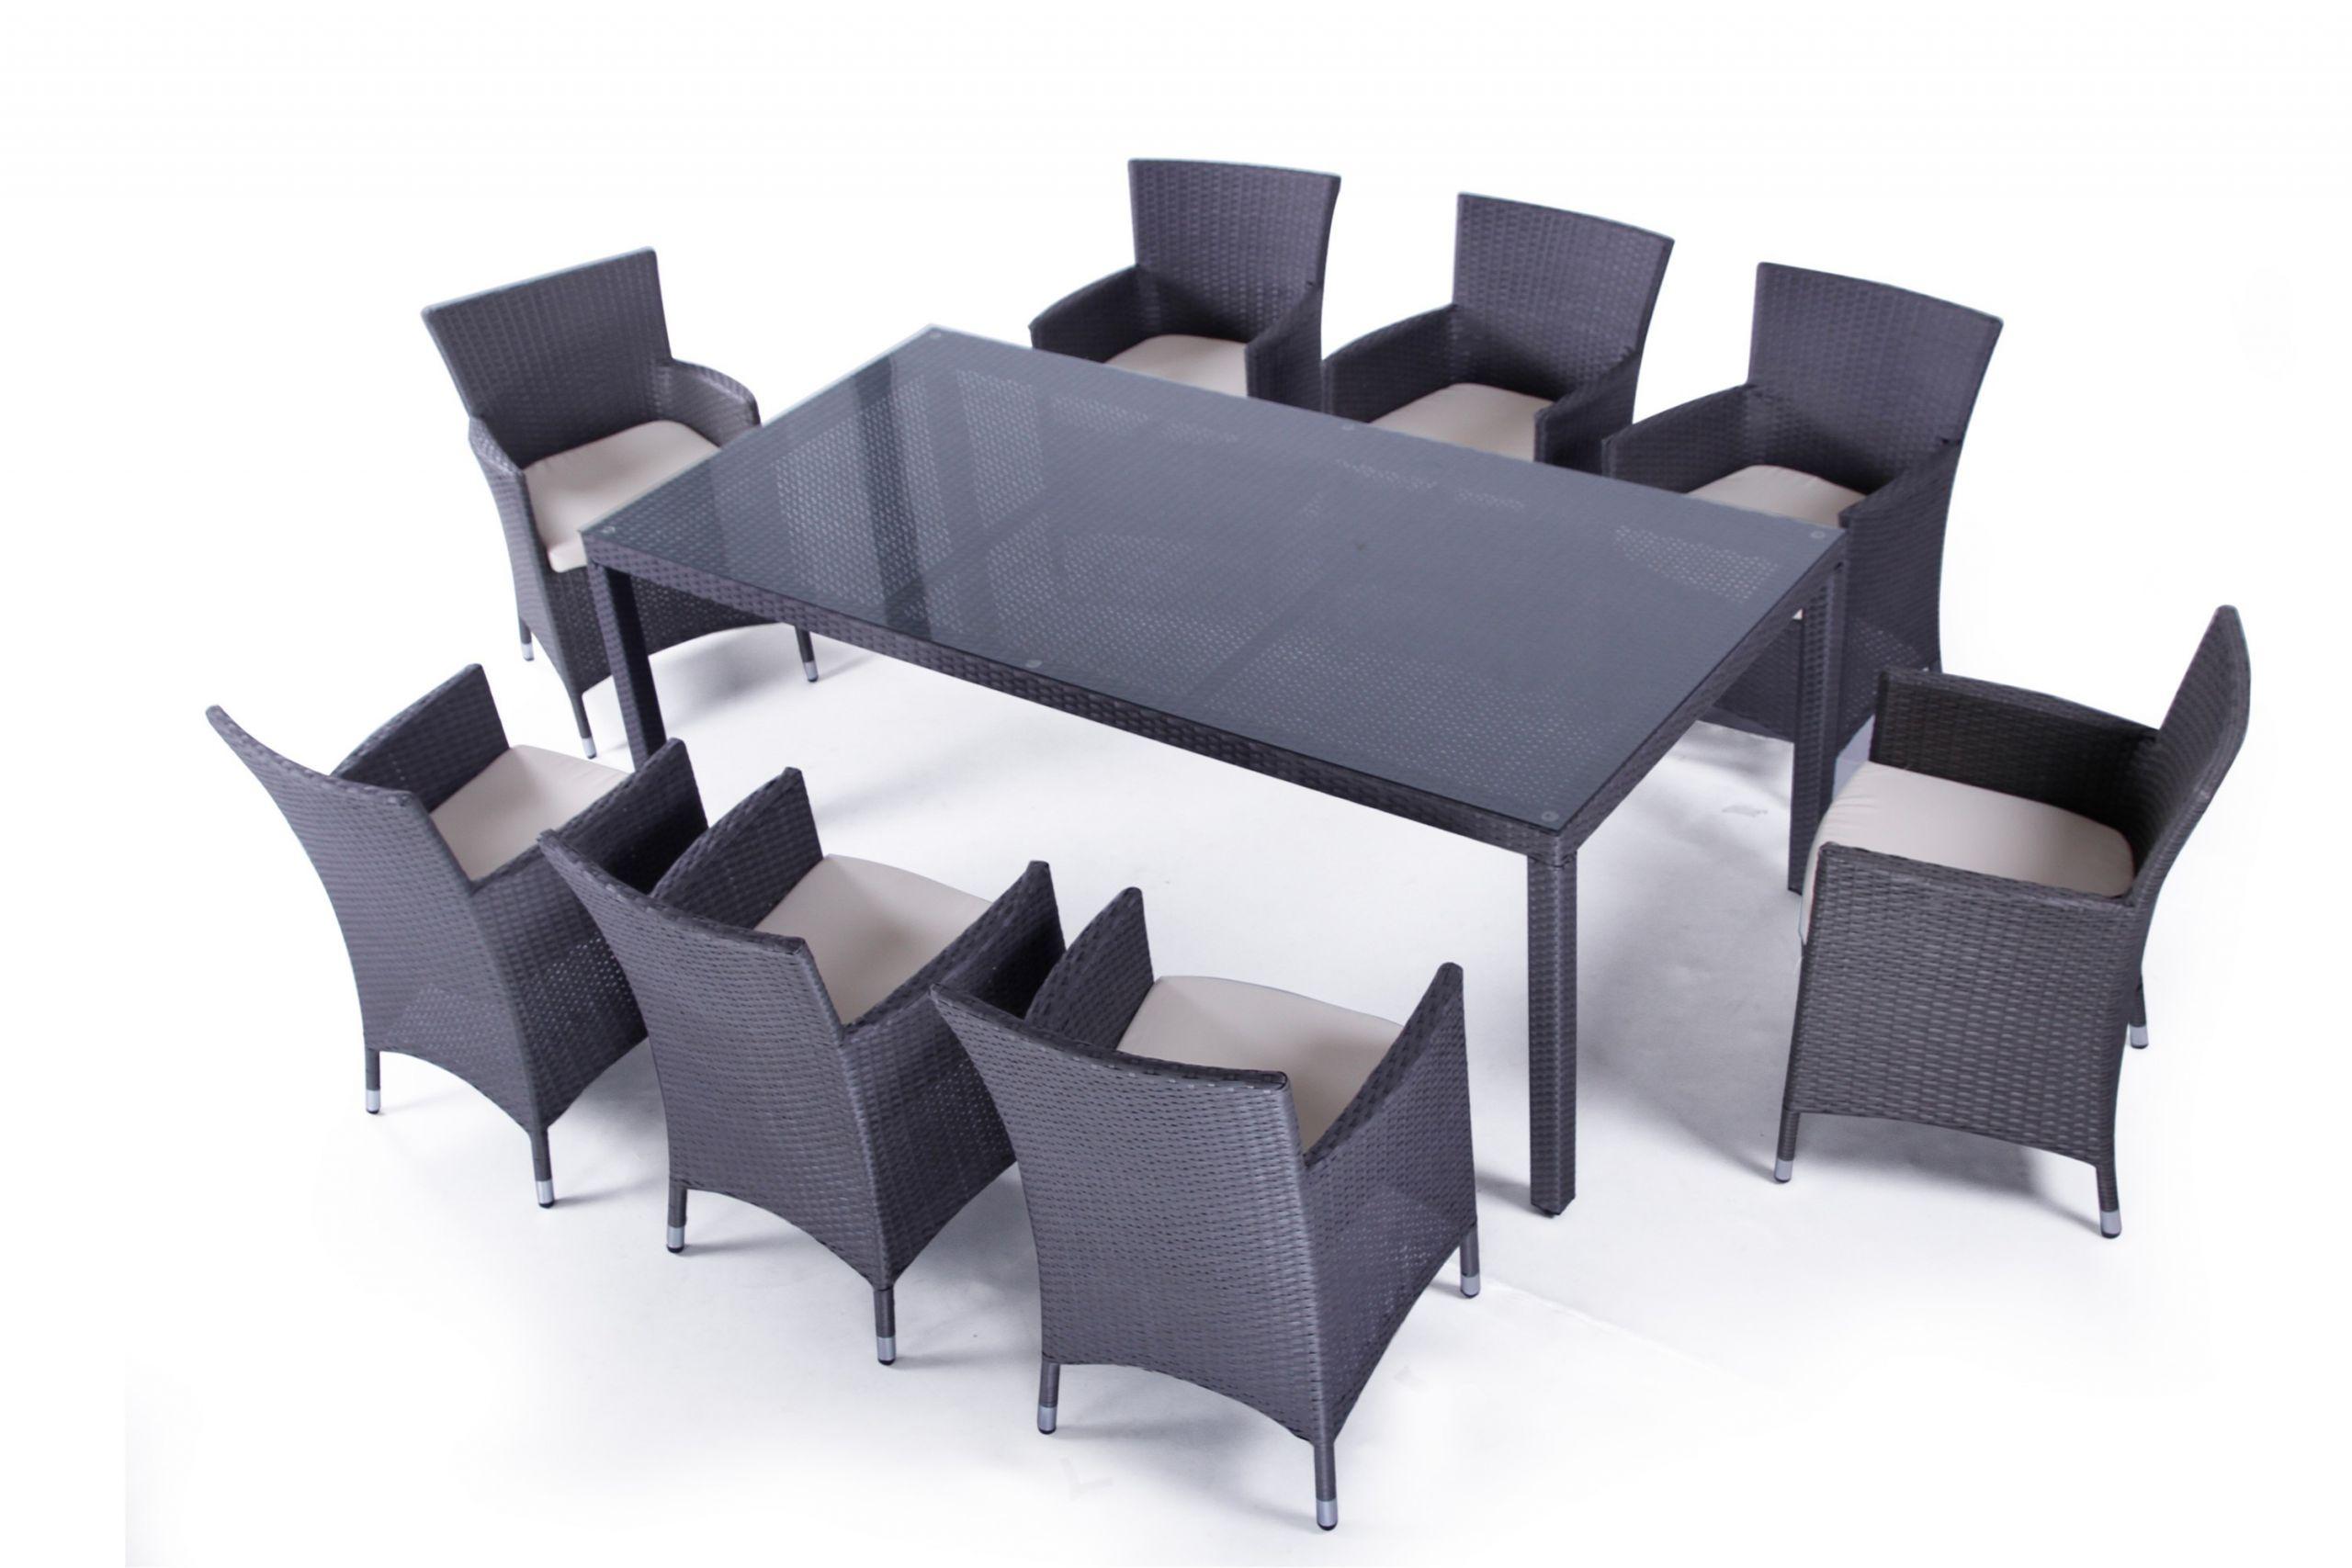 39 Best Of Tables Et Chaises De Jardin En Solde   Salon Jardin concernant Table Et Chaise De Jardin Solde